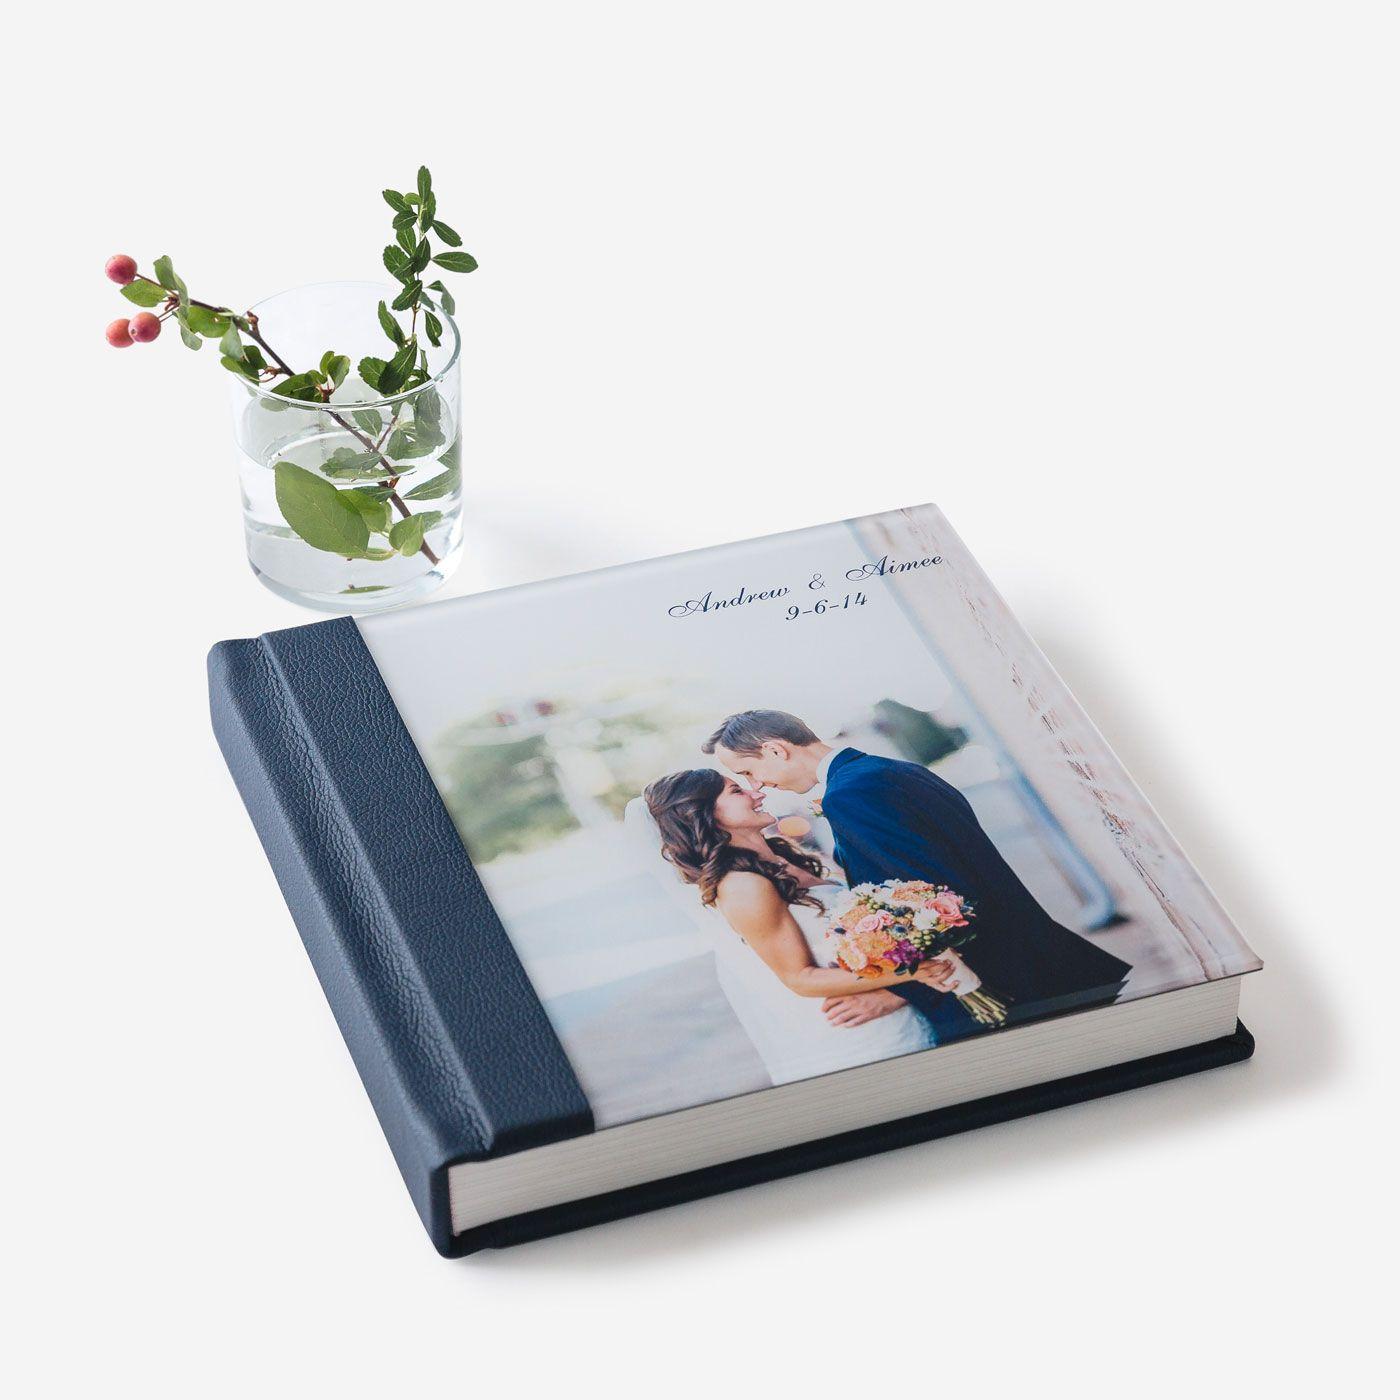 Modern Acrylic Cover Wedding Album Albums Remembered Wedding Photo Books Wedding Album Cover Design Wedding Album Cover